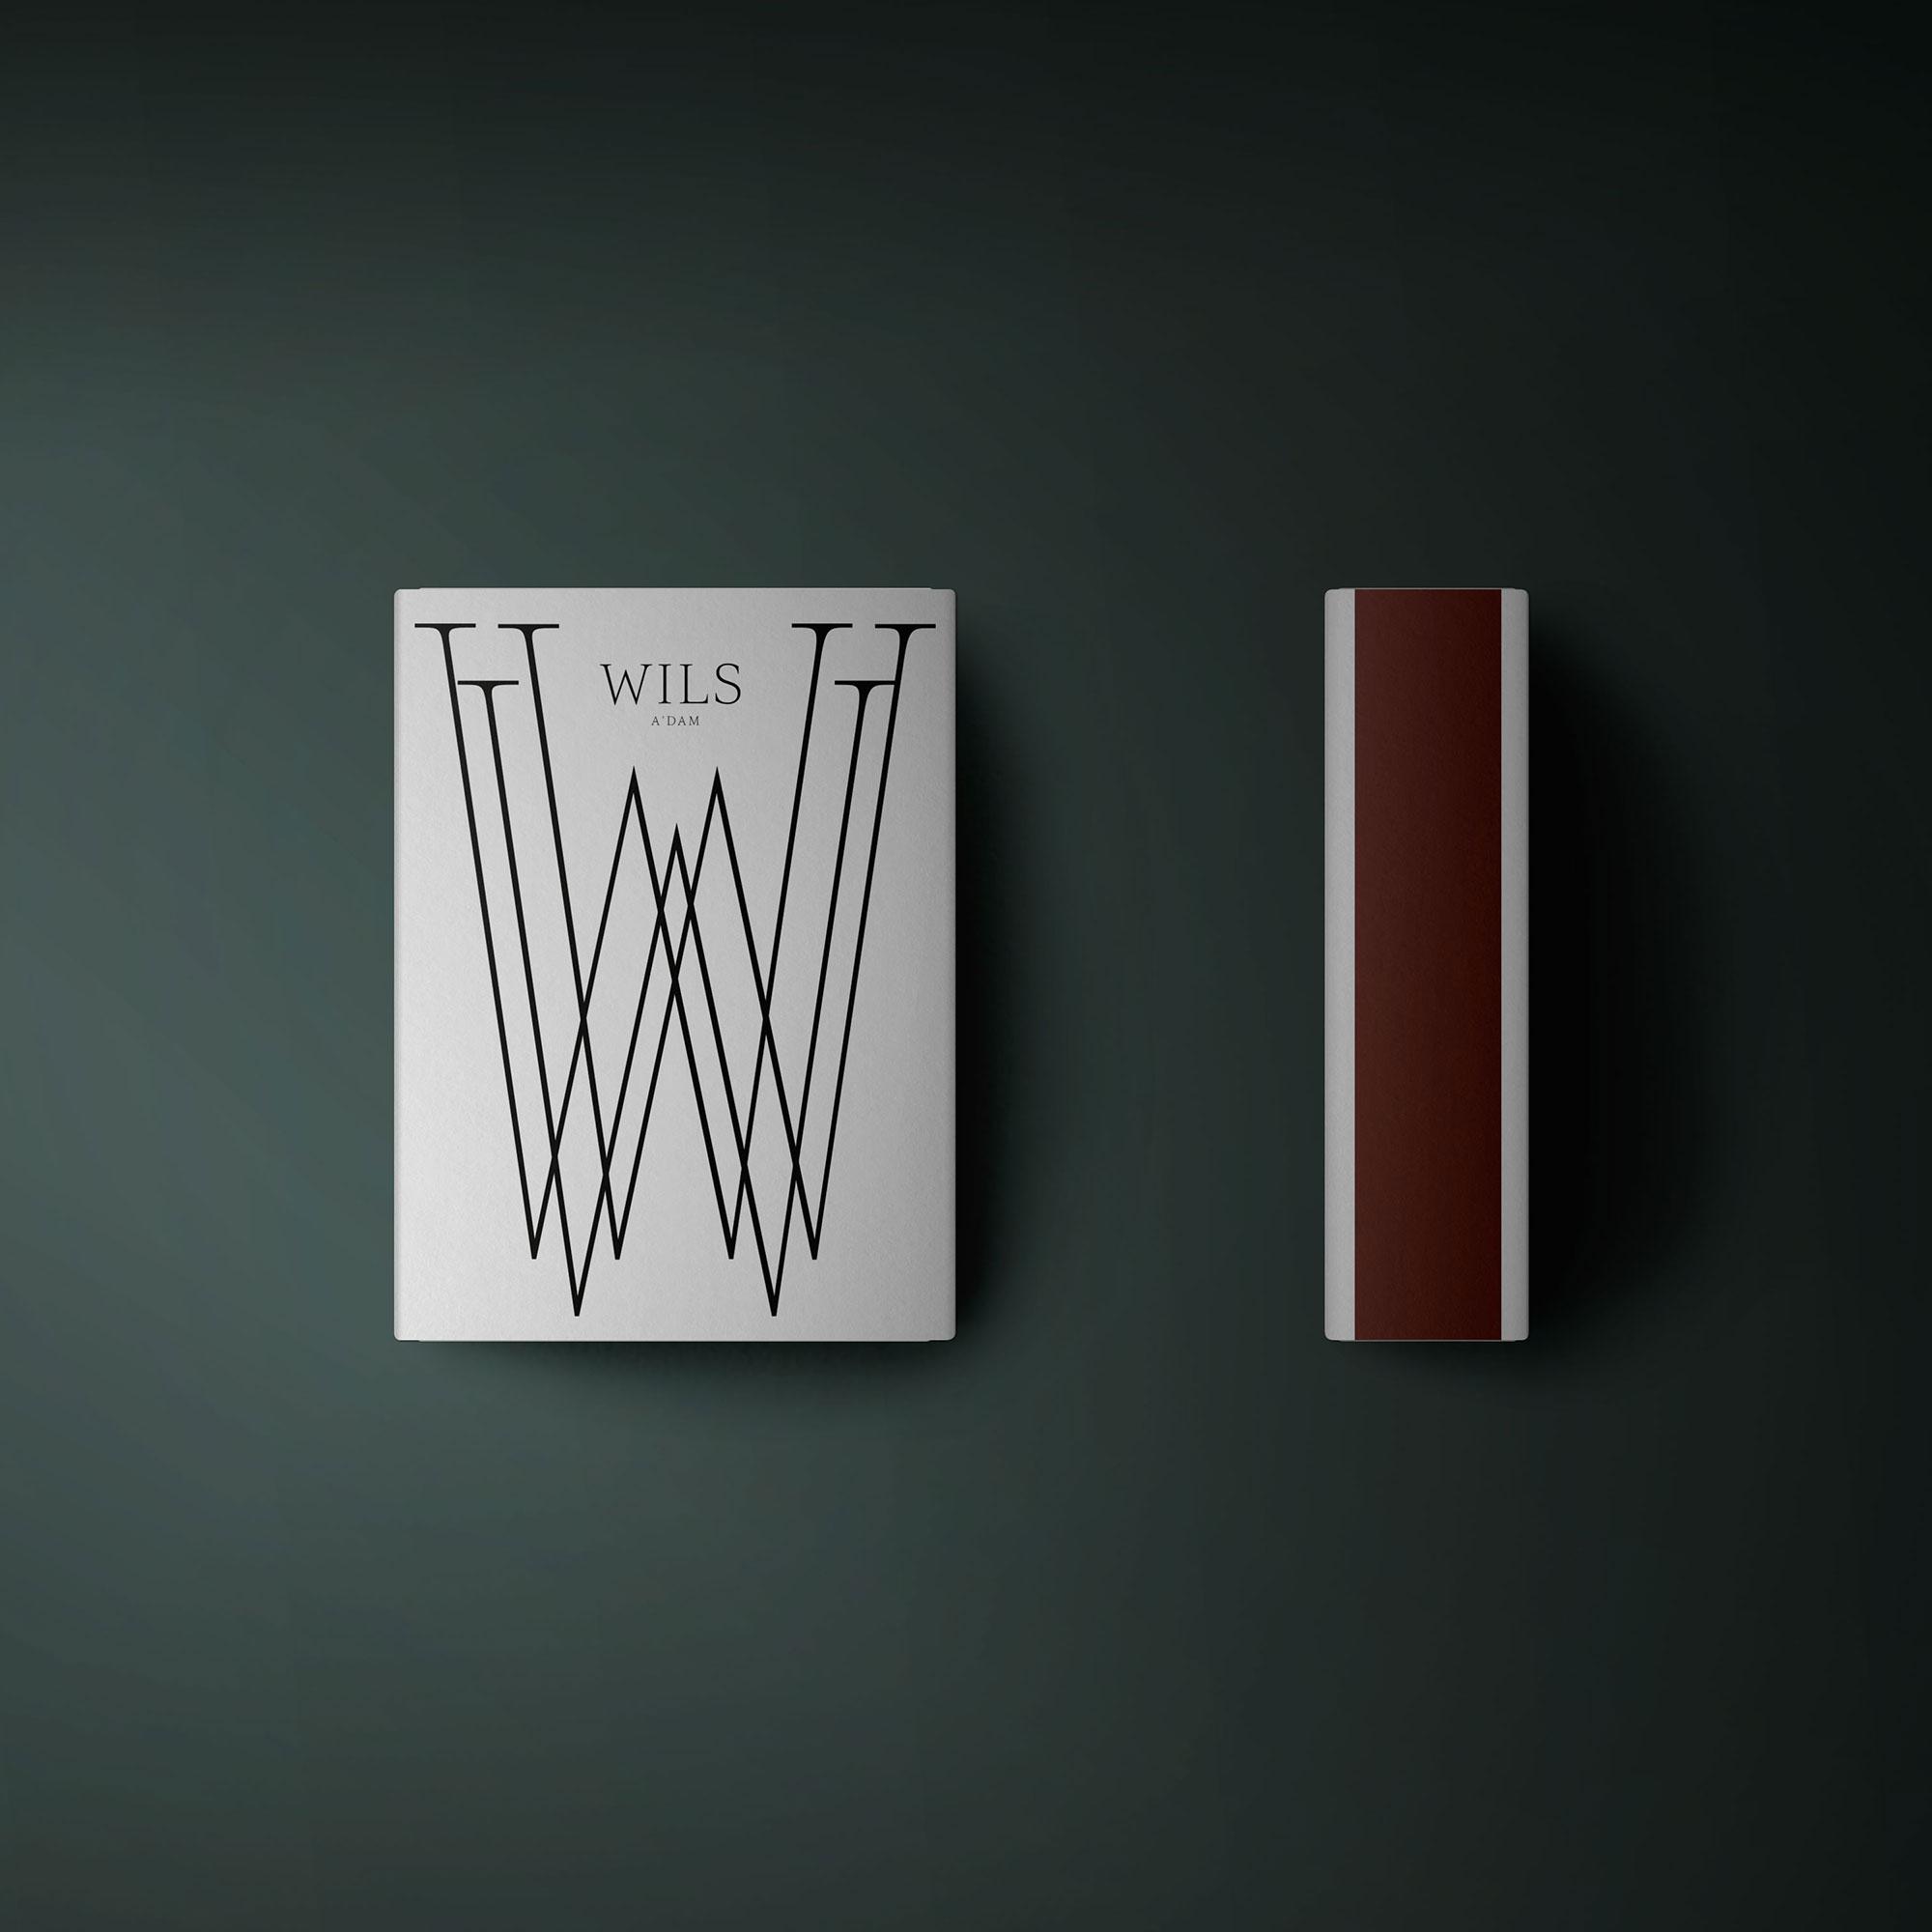 32-frontline-studio-emma-brante-macha-kontchakova-graphic-design-banding-logo-restaurant-wils-amsterdam